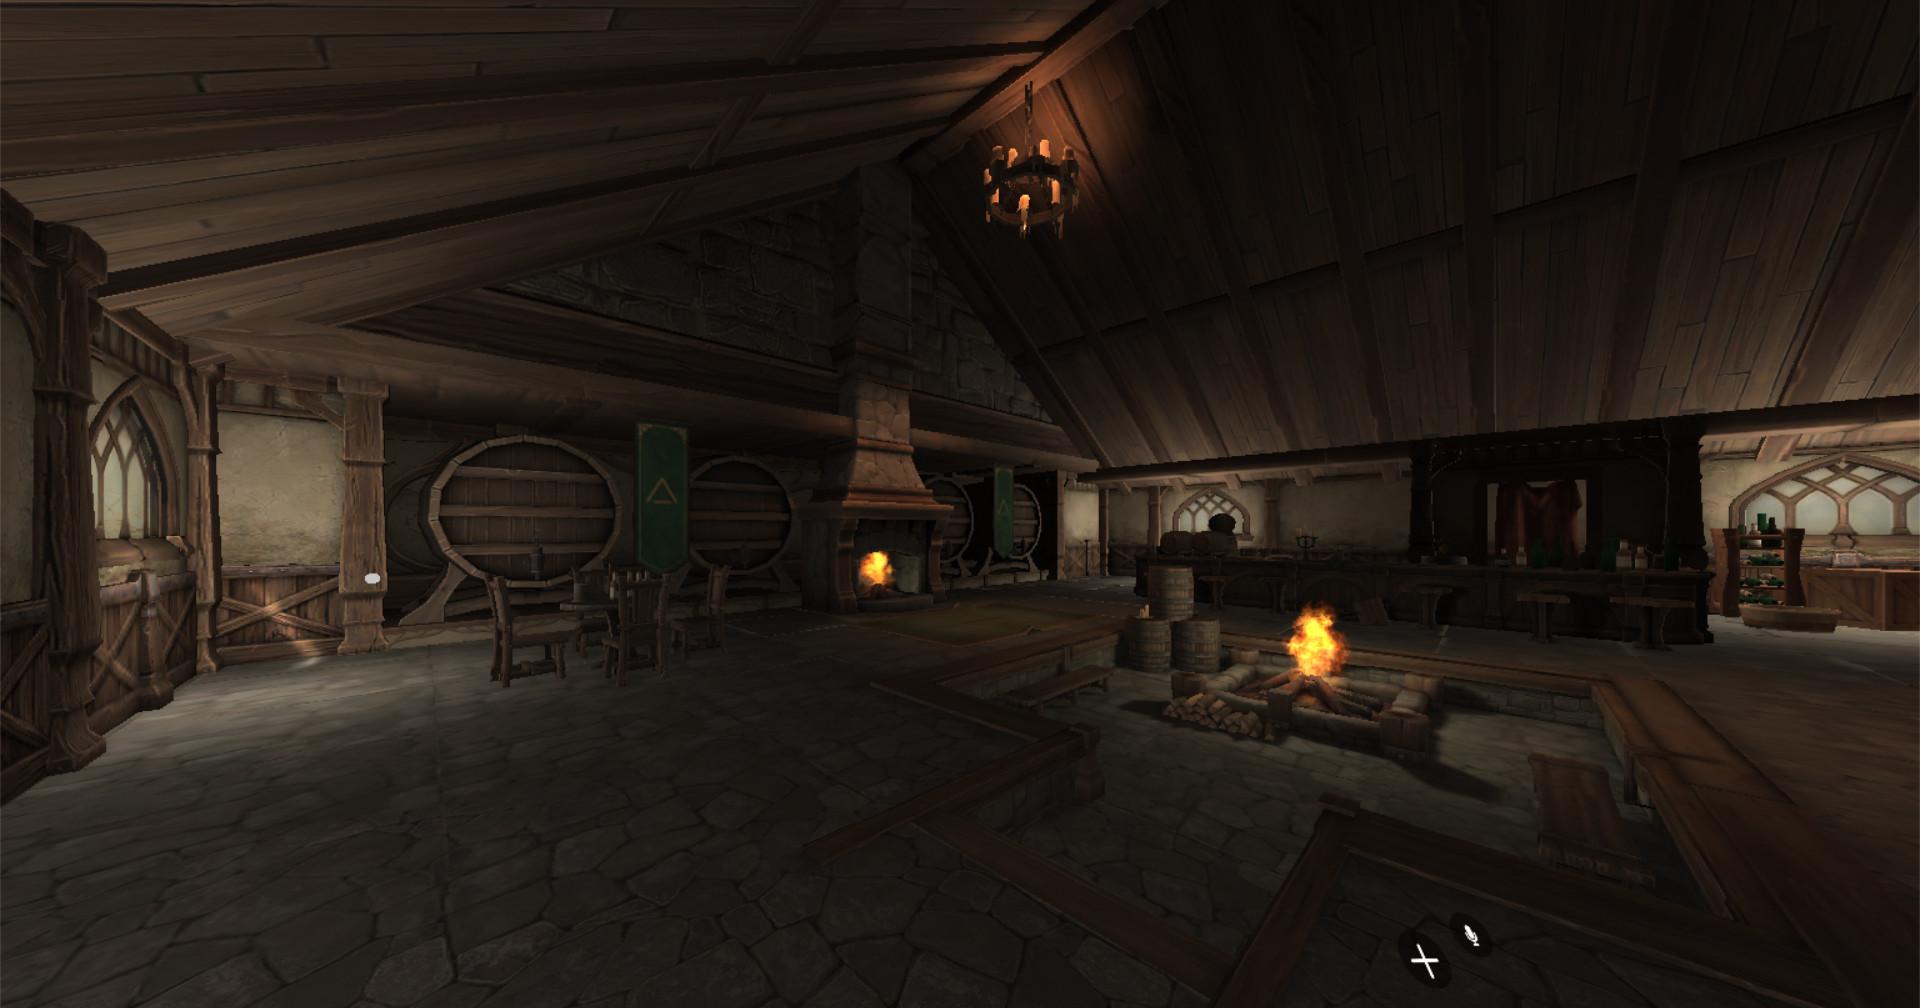 Blair scott tavern 1